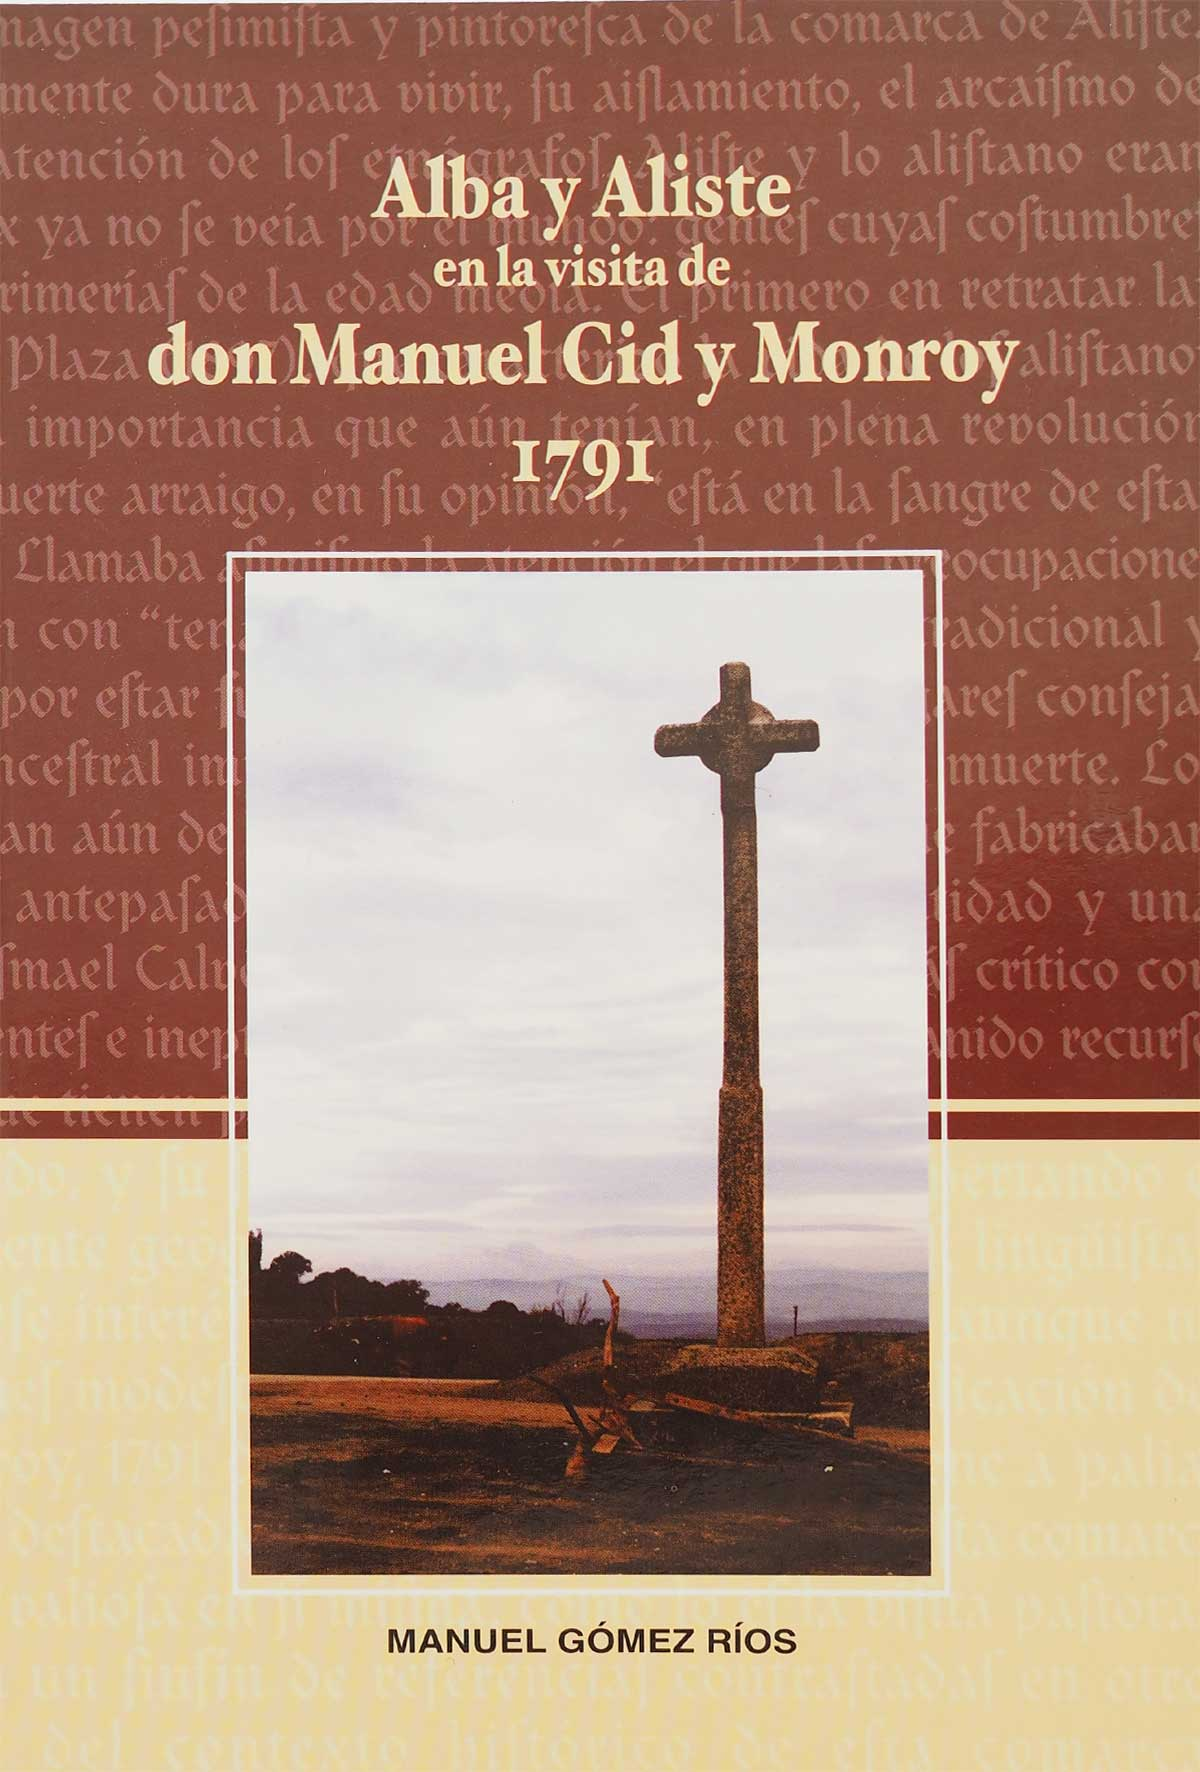 alba-aliste-visita-manuel-cid-monroy-editorial-semuret